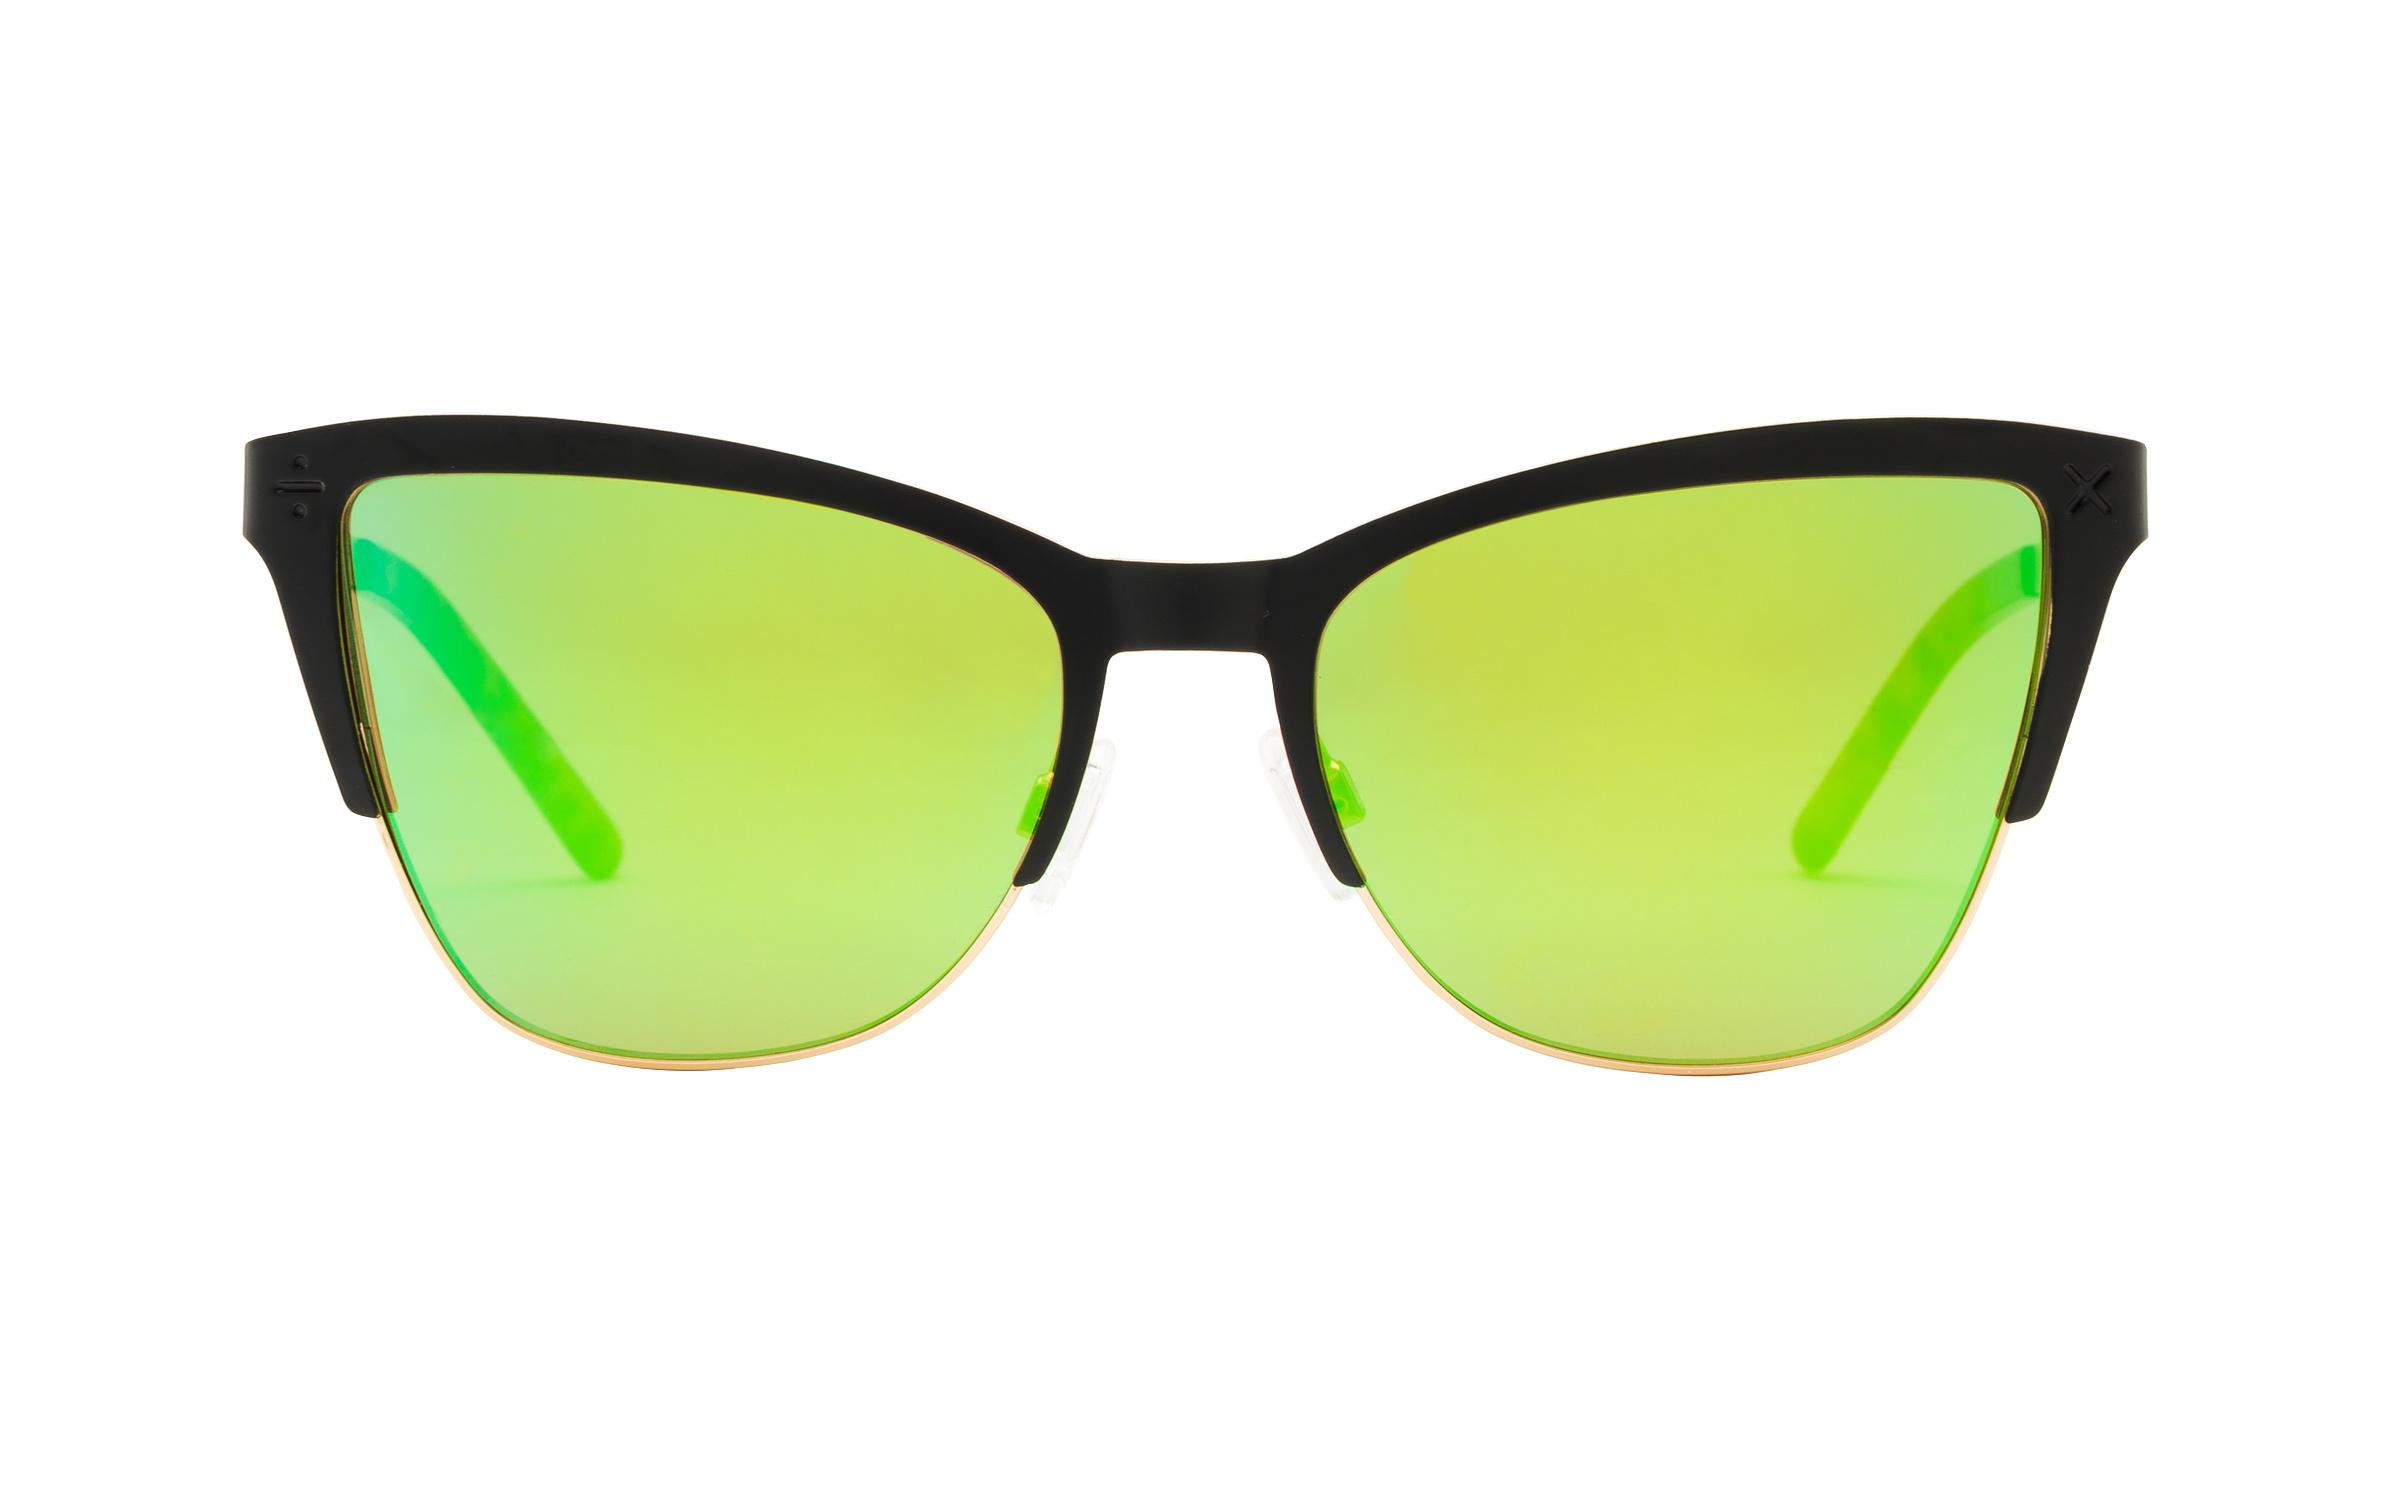 Derek Cardigan Sunglasses Vintage Black Online Coastal